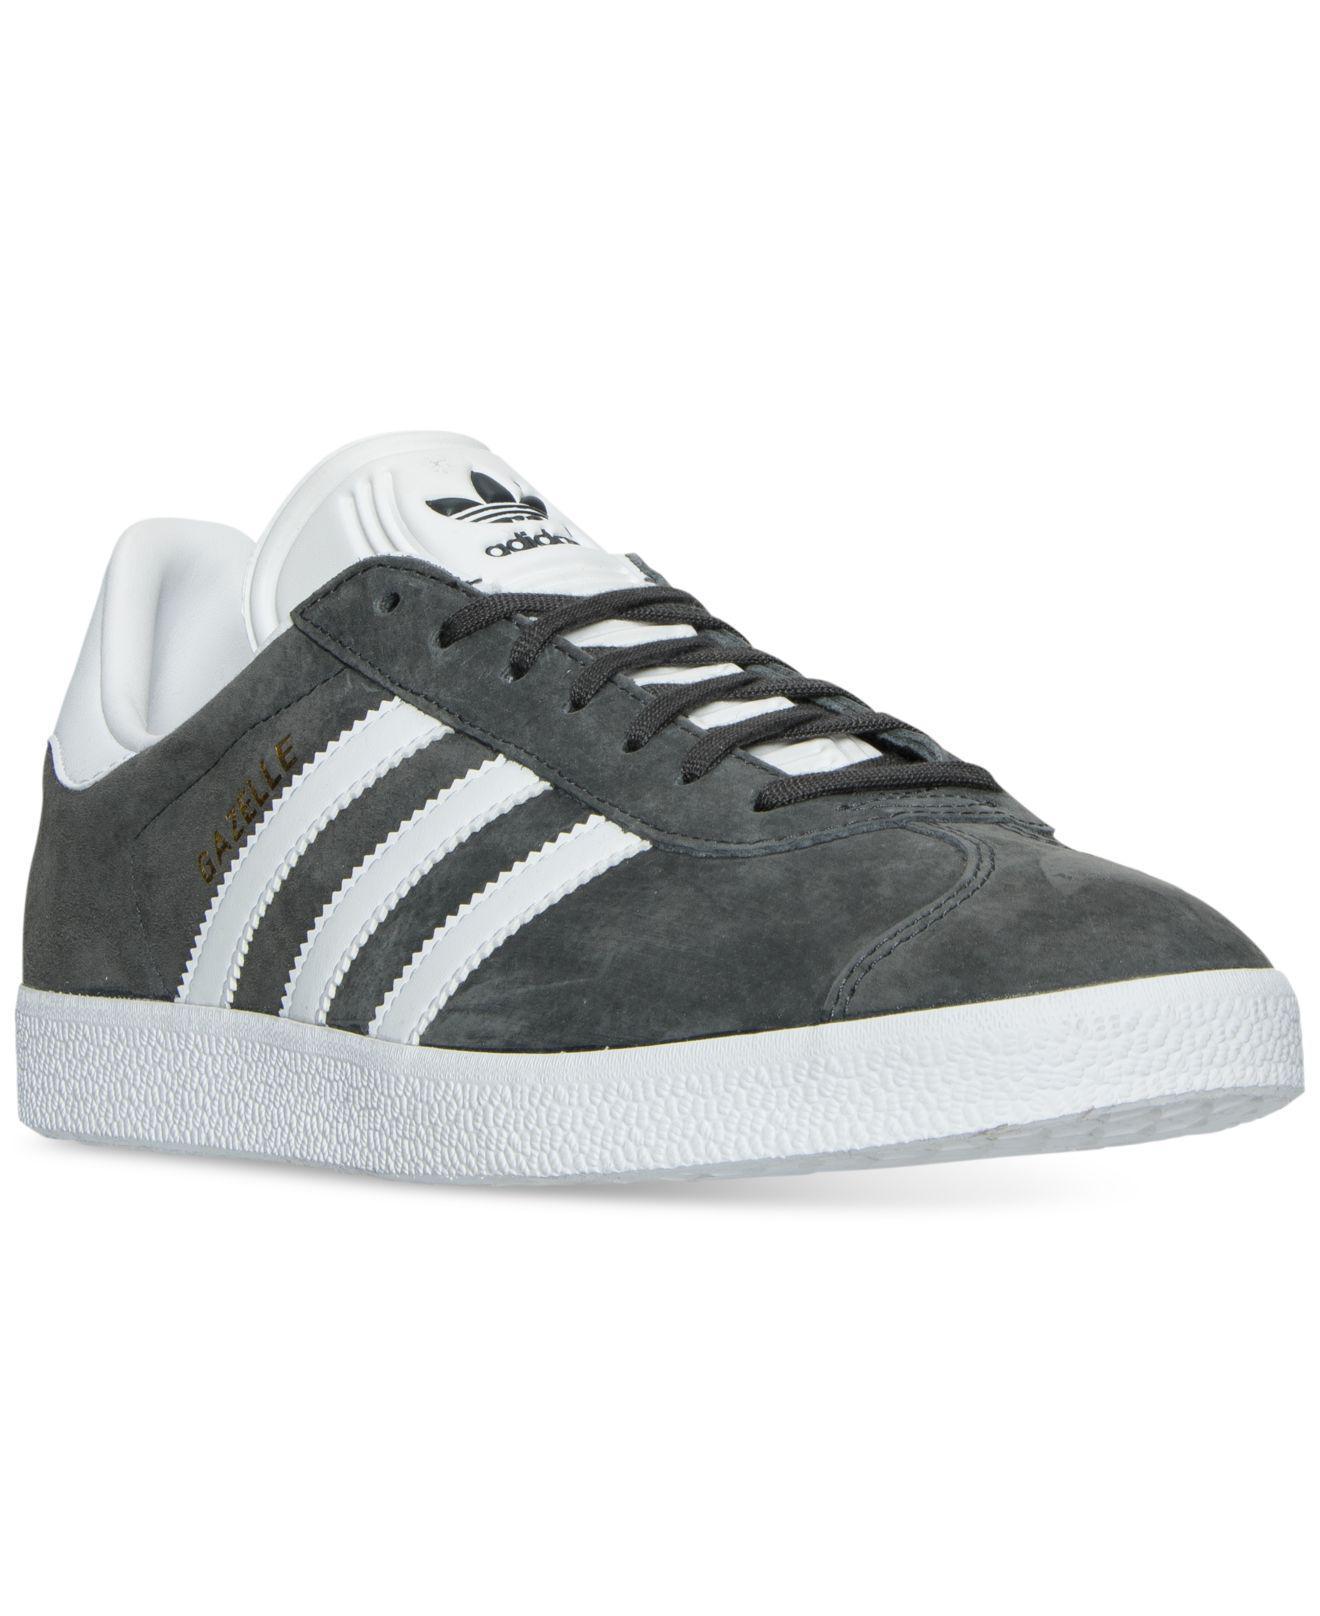 pretty nice 1bb50 030ed Lyst - Adidas Originals Mens Gazelle Sport Pack Casual Sneak